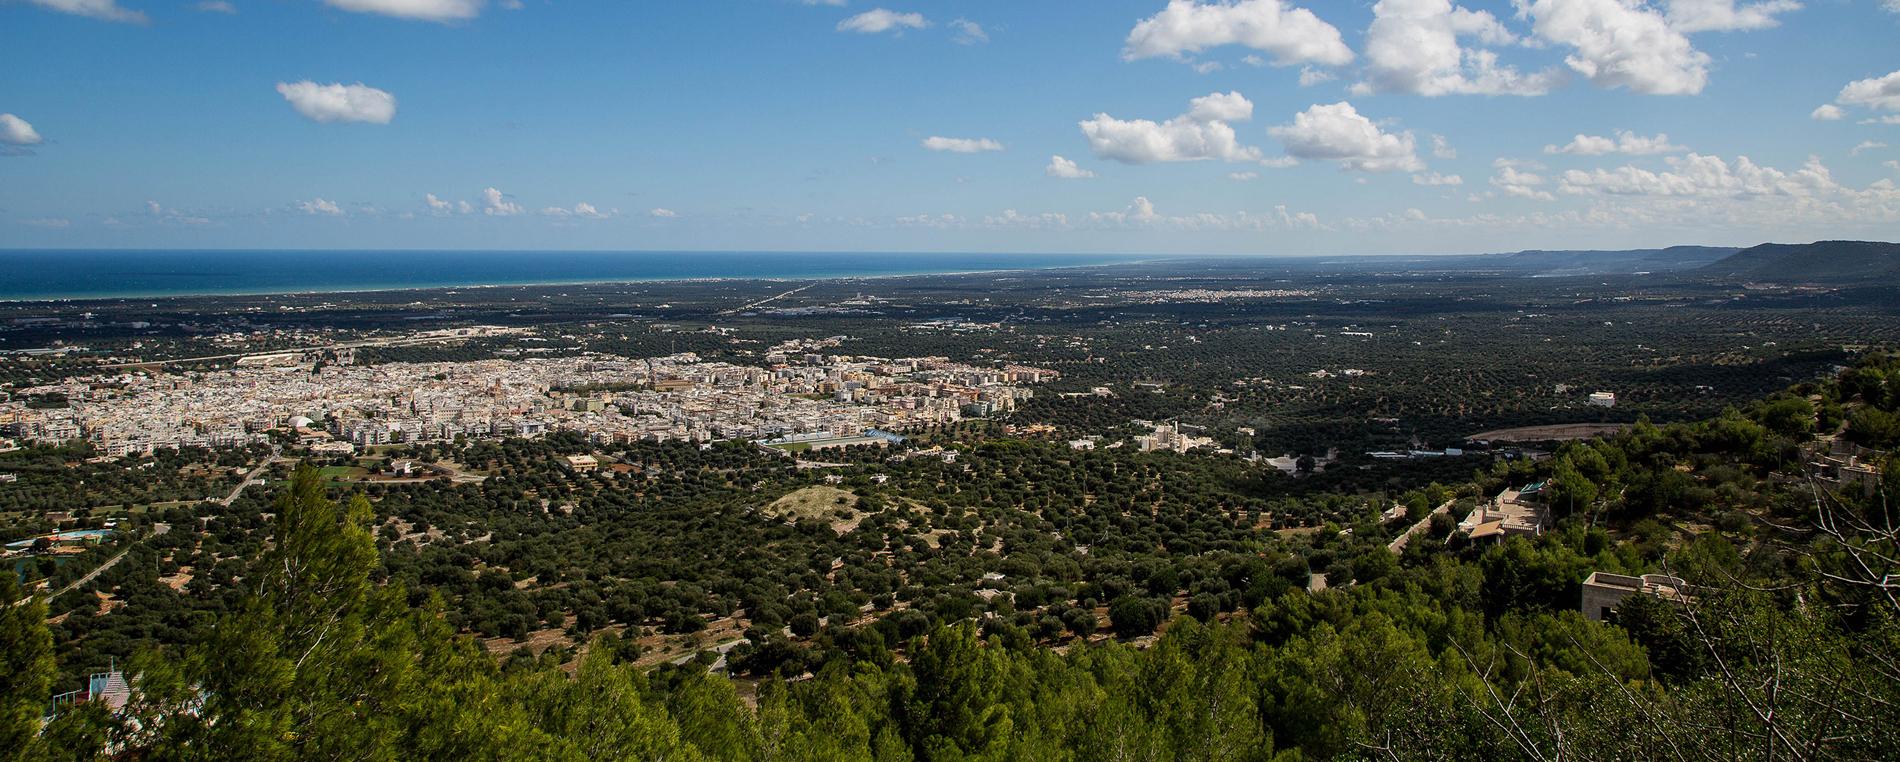 Punto panoramico nella Valle d'Itria